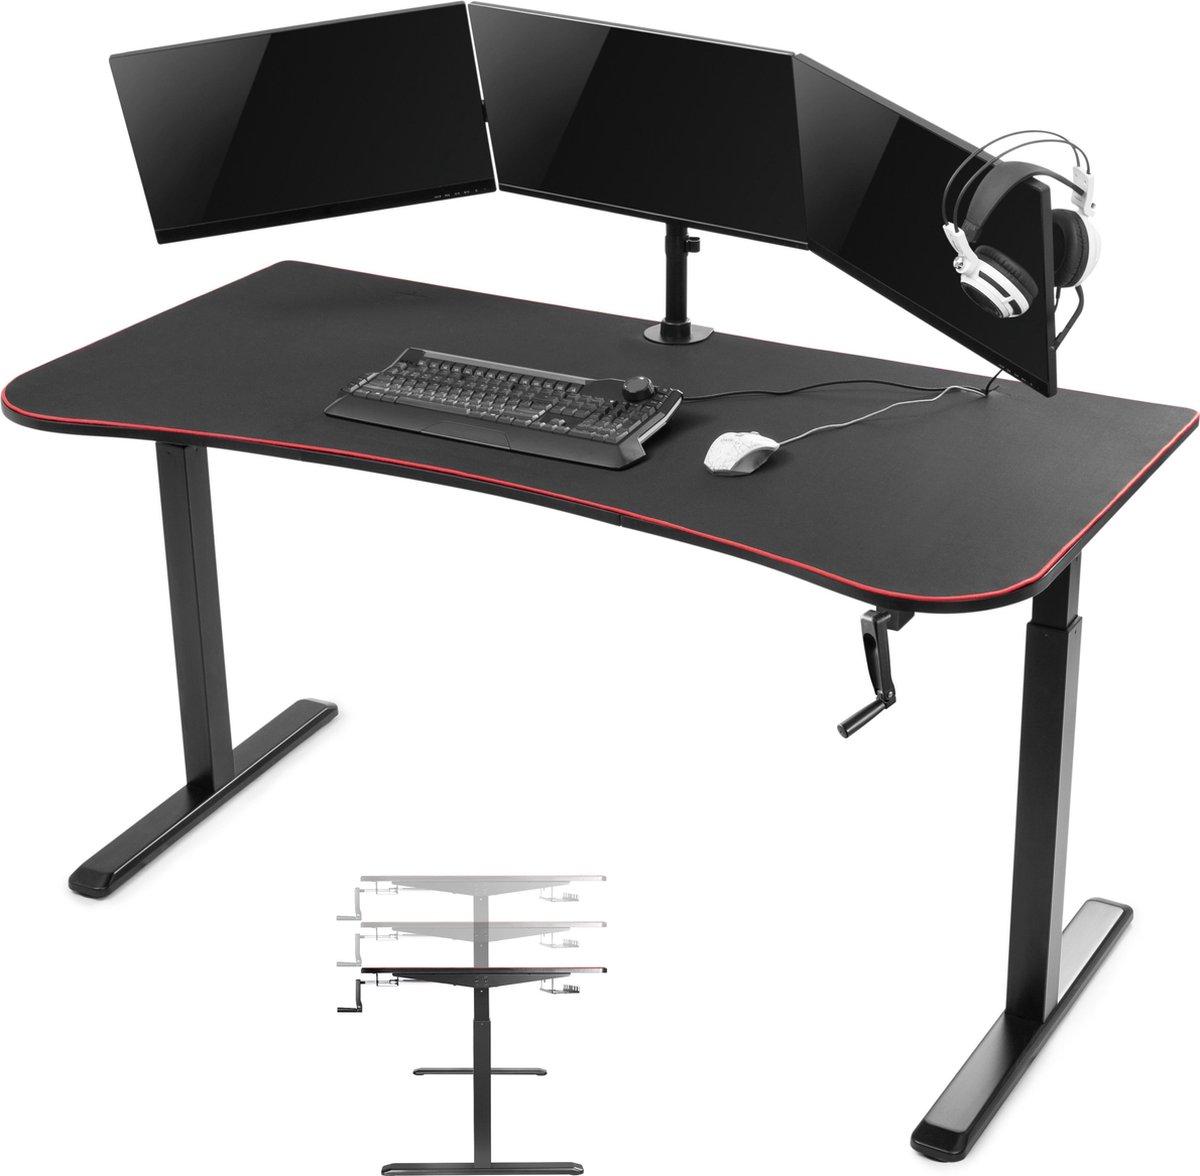 Computer game bureau gaming desk Thomas - zit sta - in hoogte verstelbaar - 160 cm x 80 cm